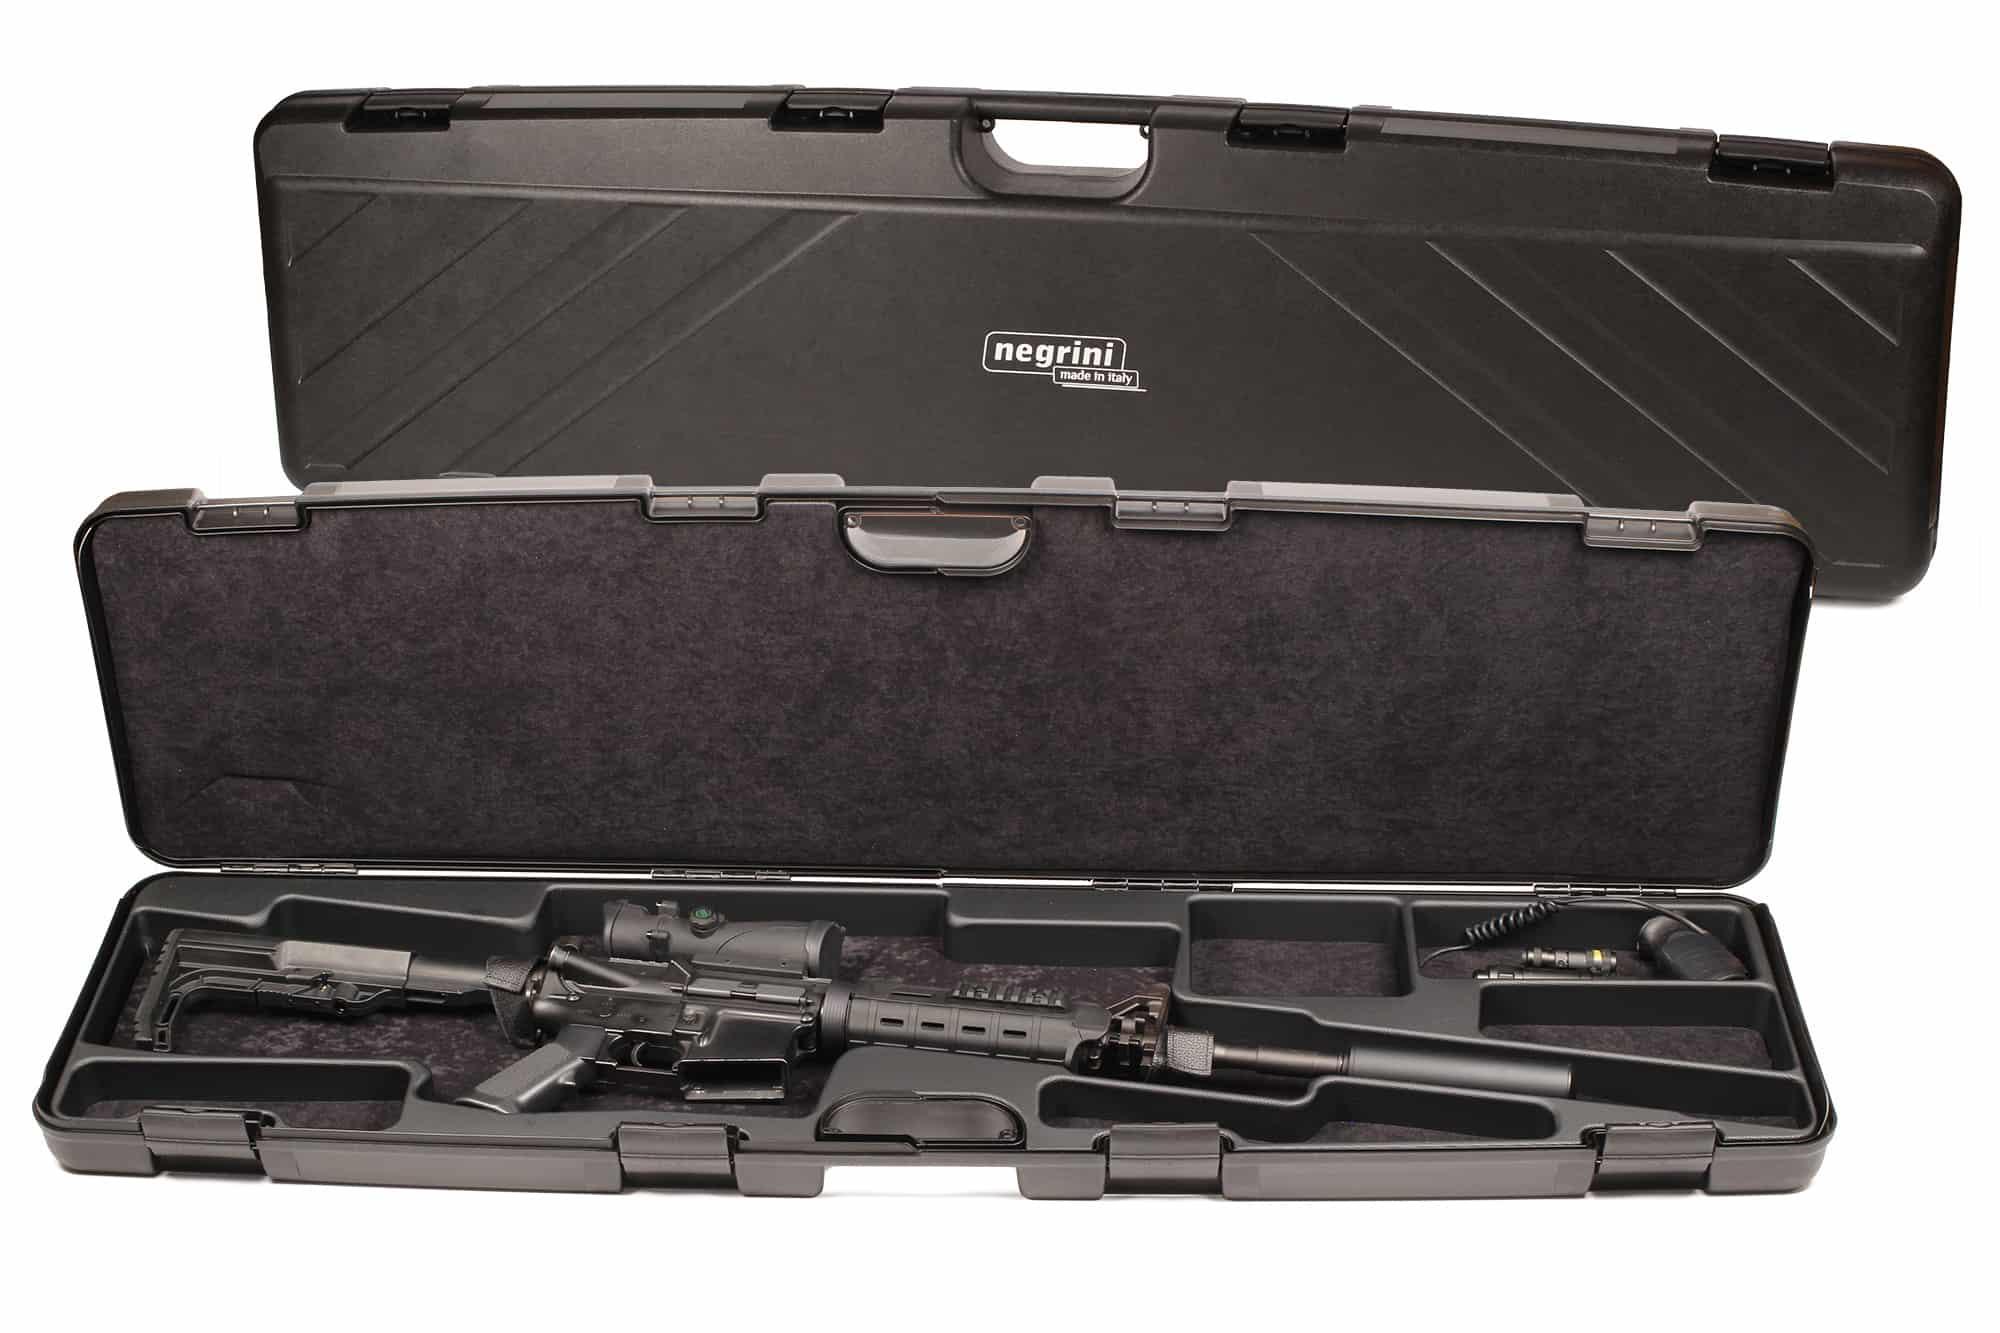 Negrini Hybrid AR-15 Tactical Rifle Case - 1685ISY/5453